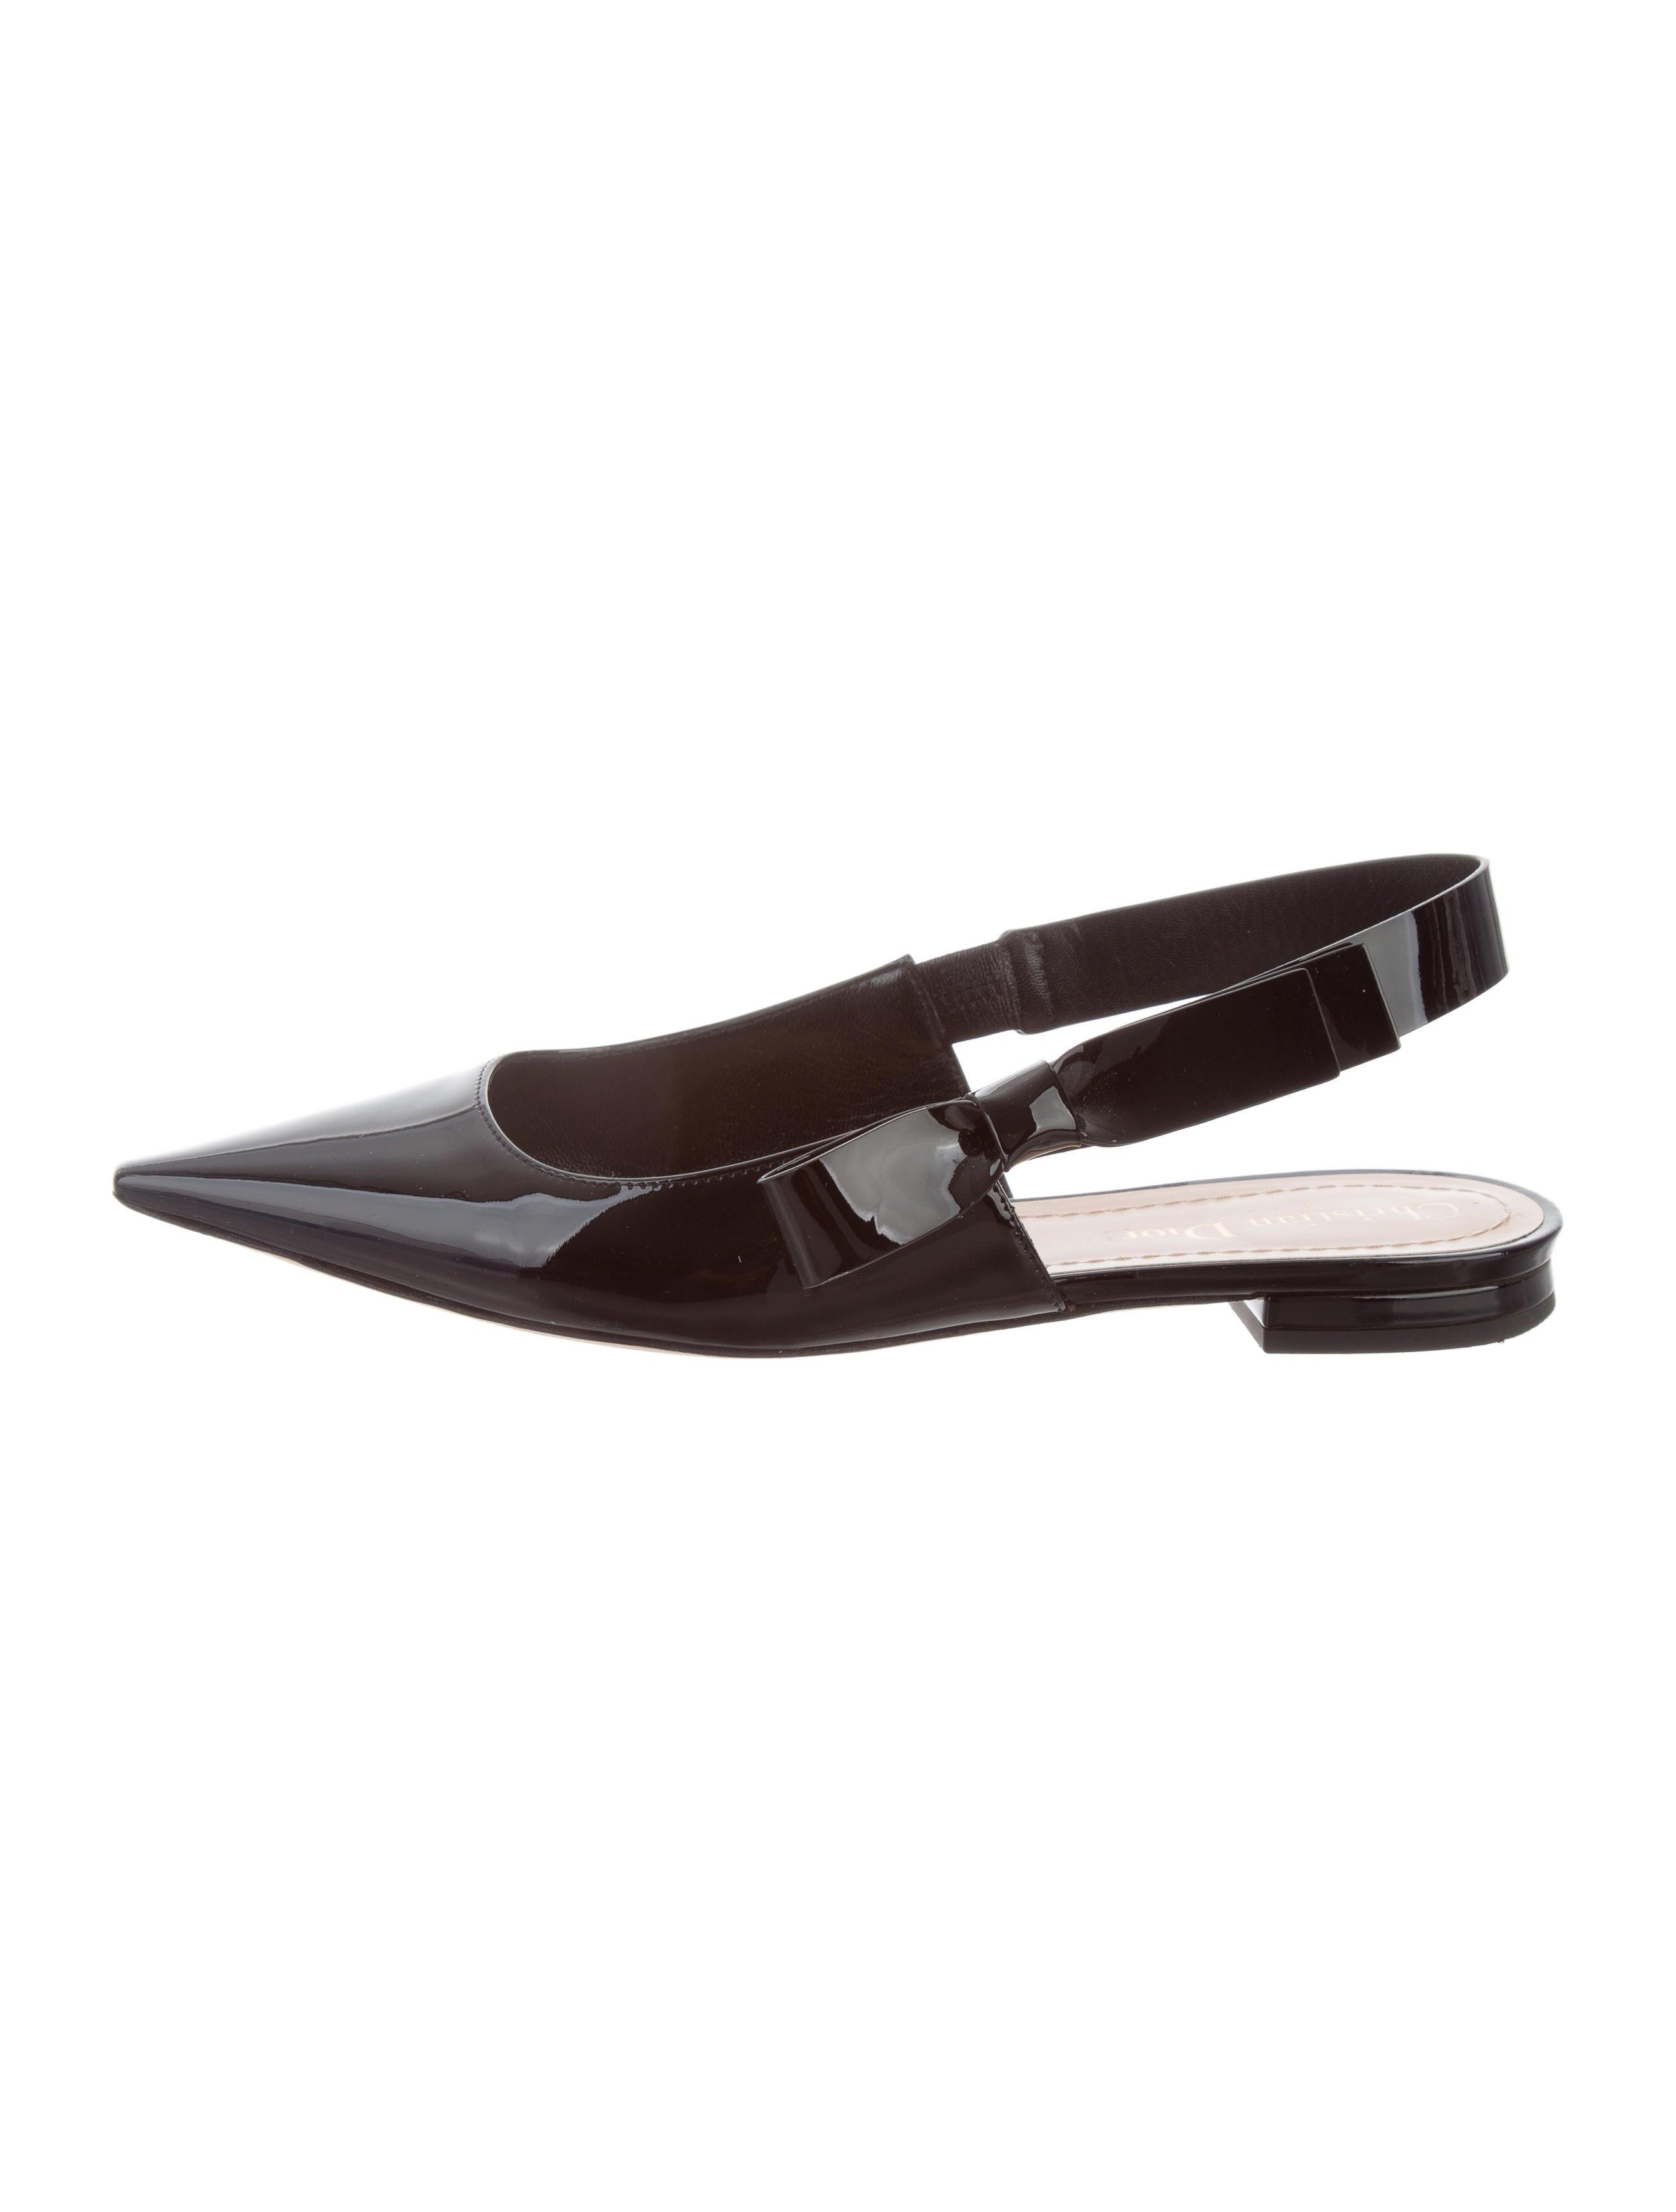 f3ee866068d3 Christian Dior Bow Slingback Flats - Shoes - CHR63314